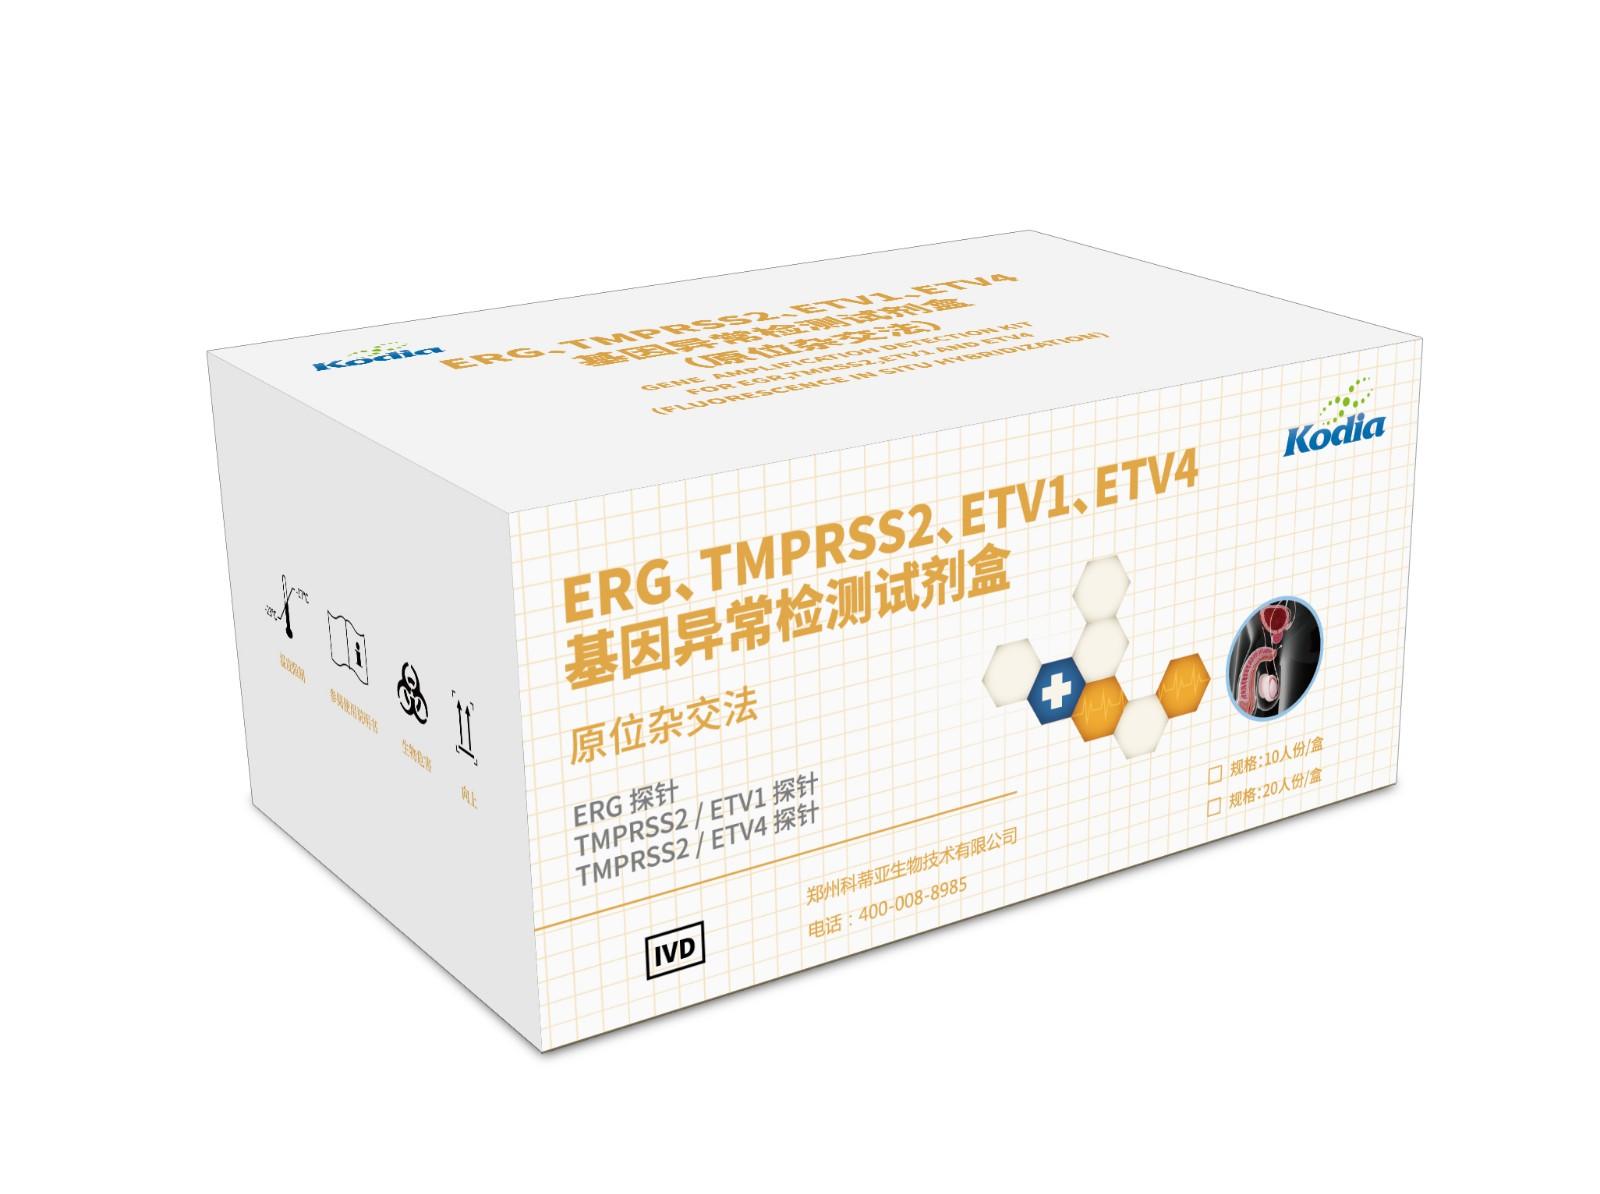 ERG、TMPRSS2、ETV1、ETV4 基因異常檢測試劑盒(原位雜交法)